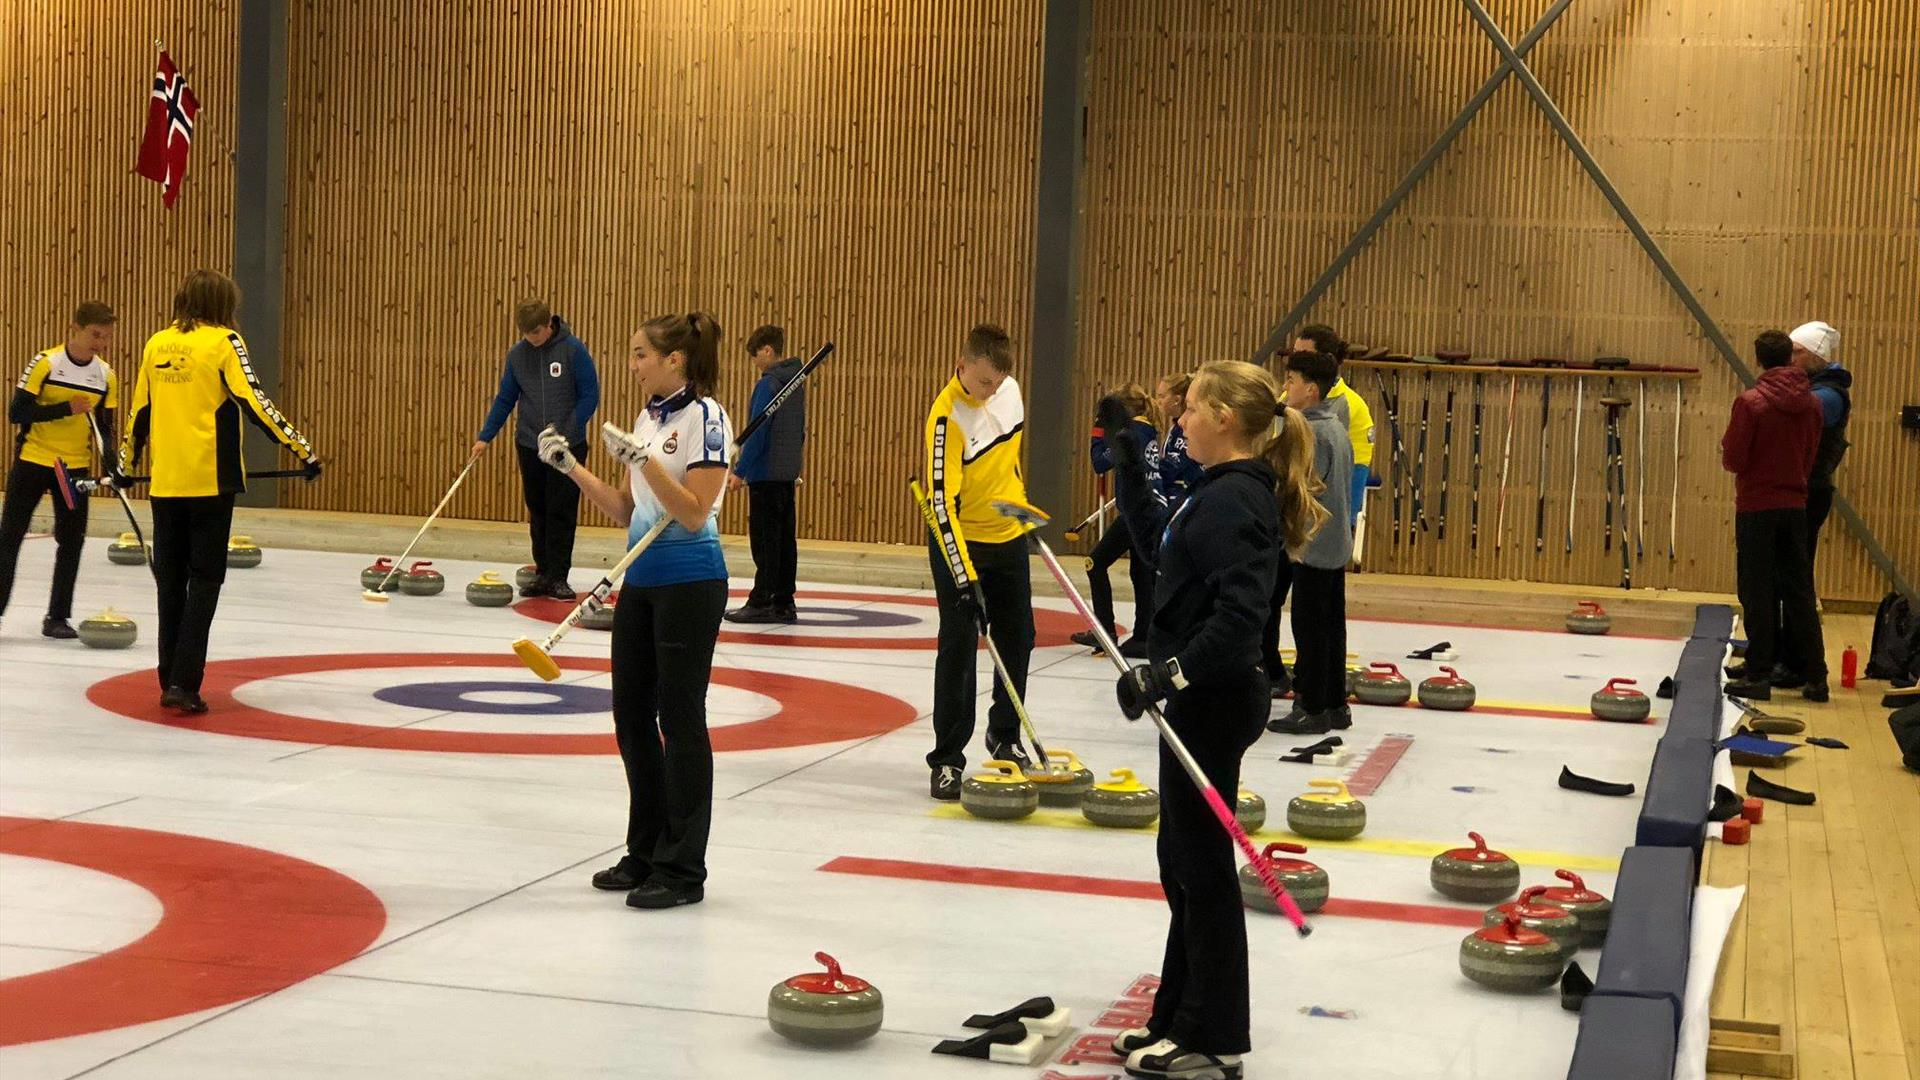 Flere lag på banen - curling